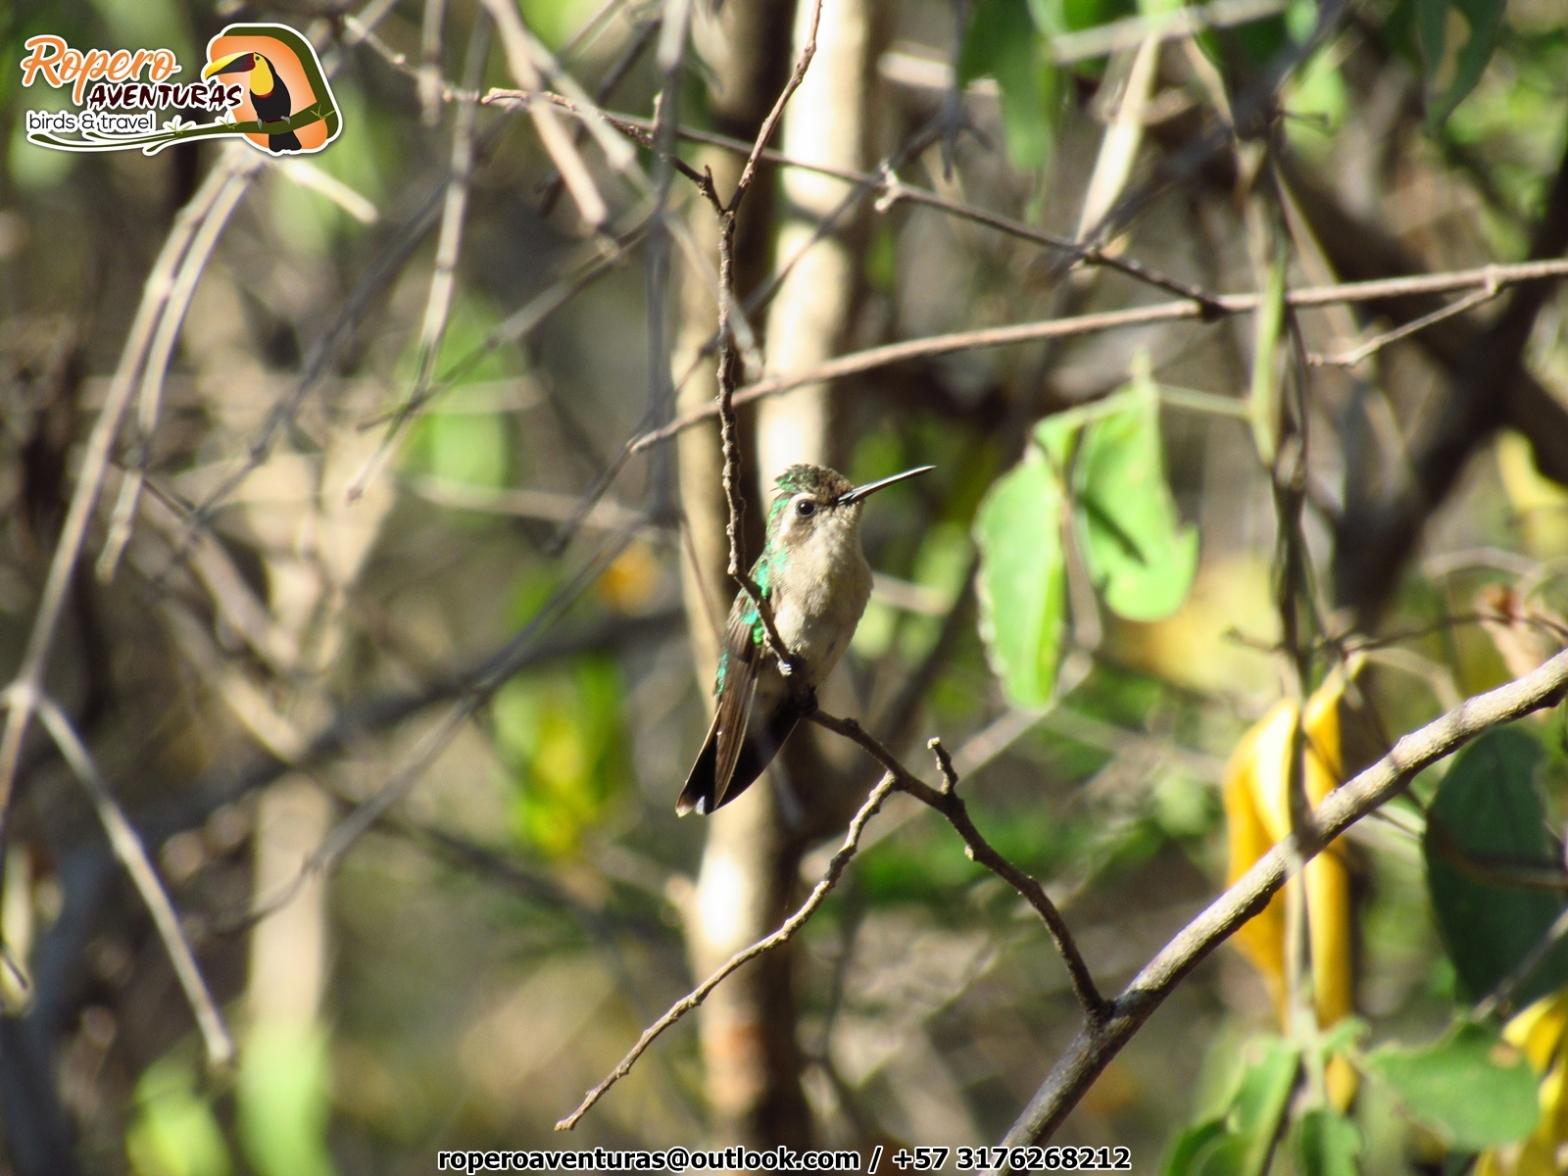 Un colibri hembra posado en la vegetacion